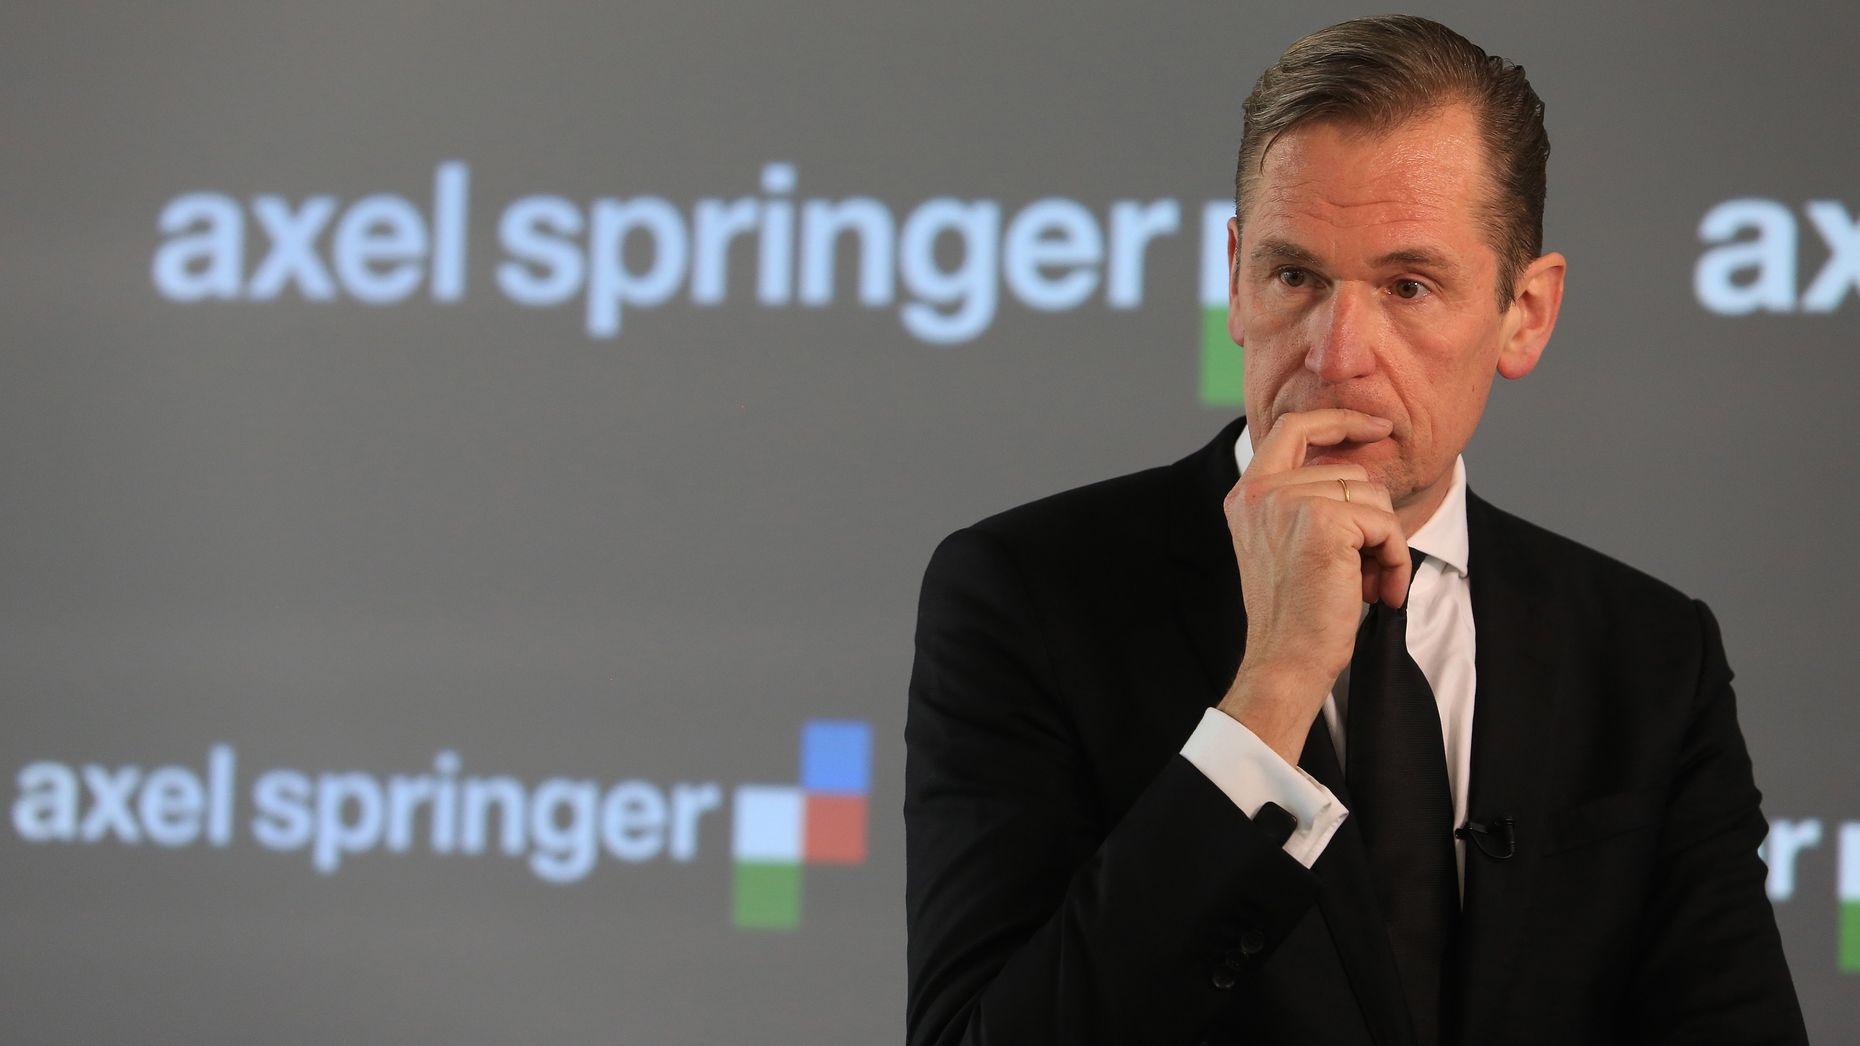 Axel Springer CEO Mathias Döpfner. Photo by Bloomberg.